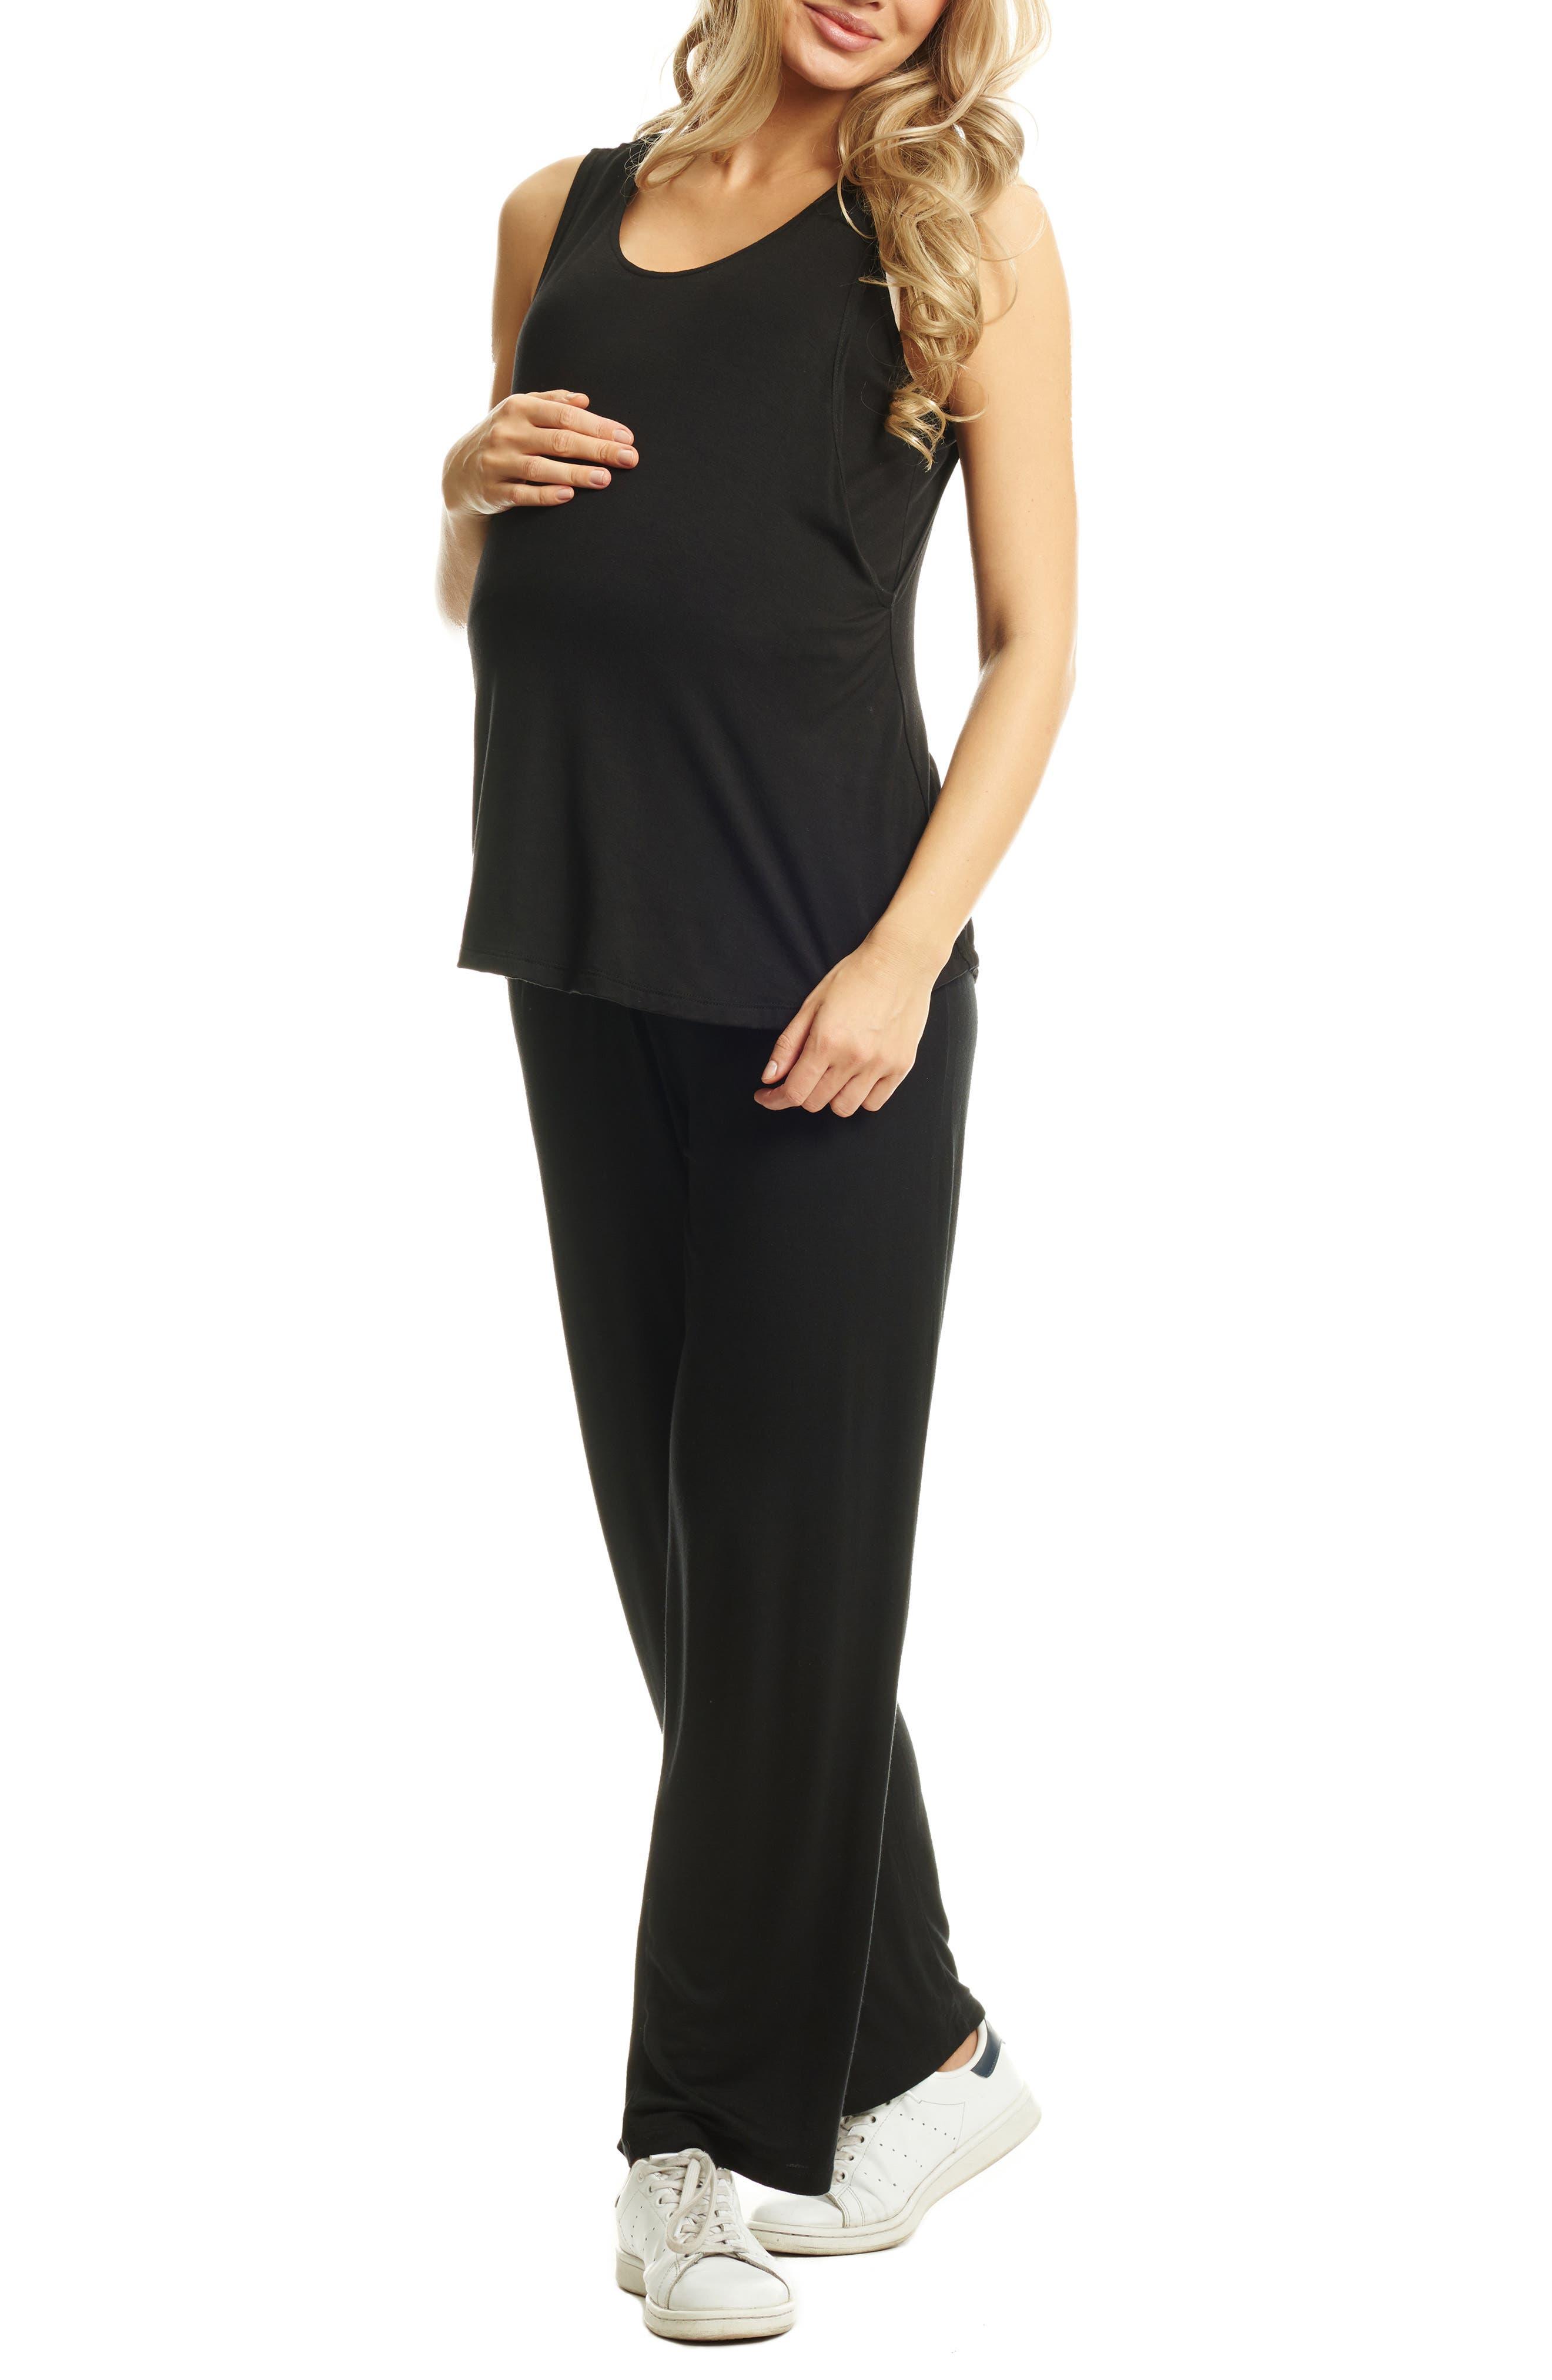 Women's Everly Grey Jacqueline Maternity/nursing Tank & Pants